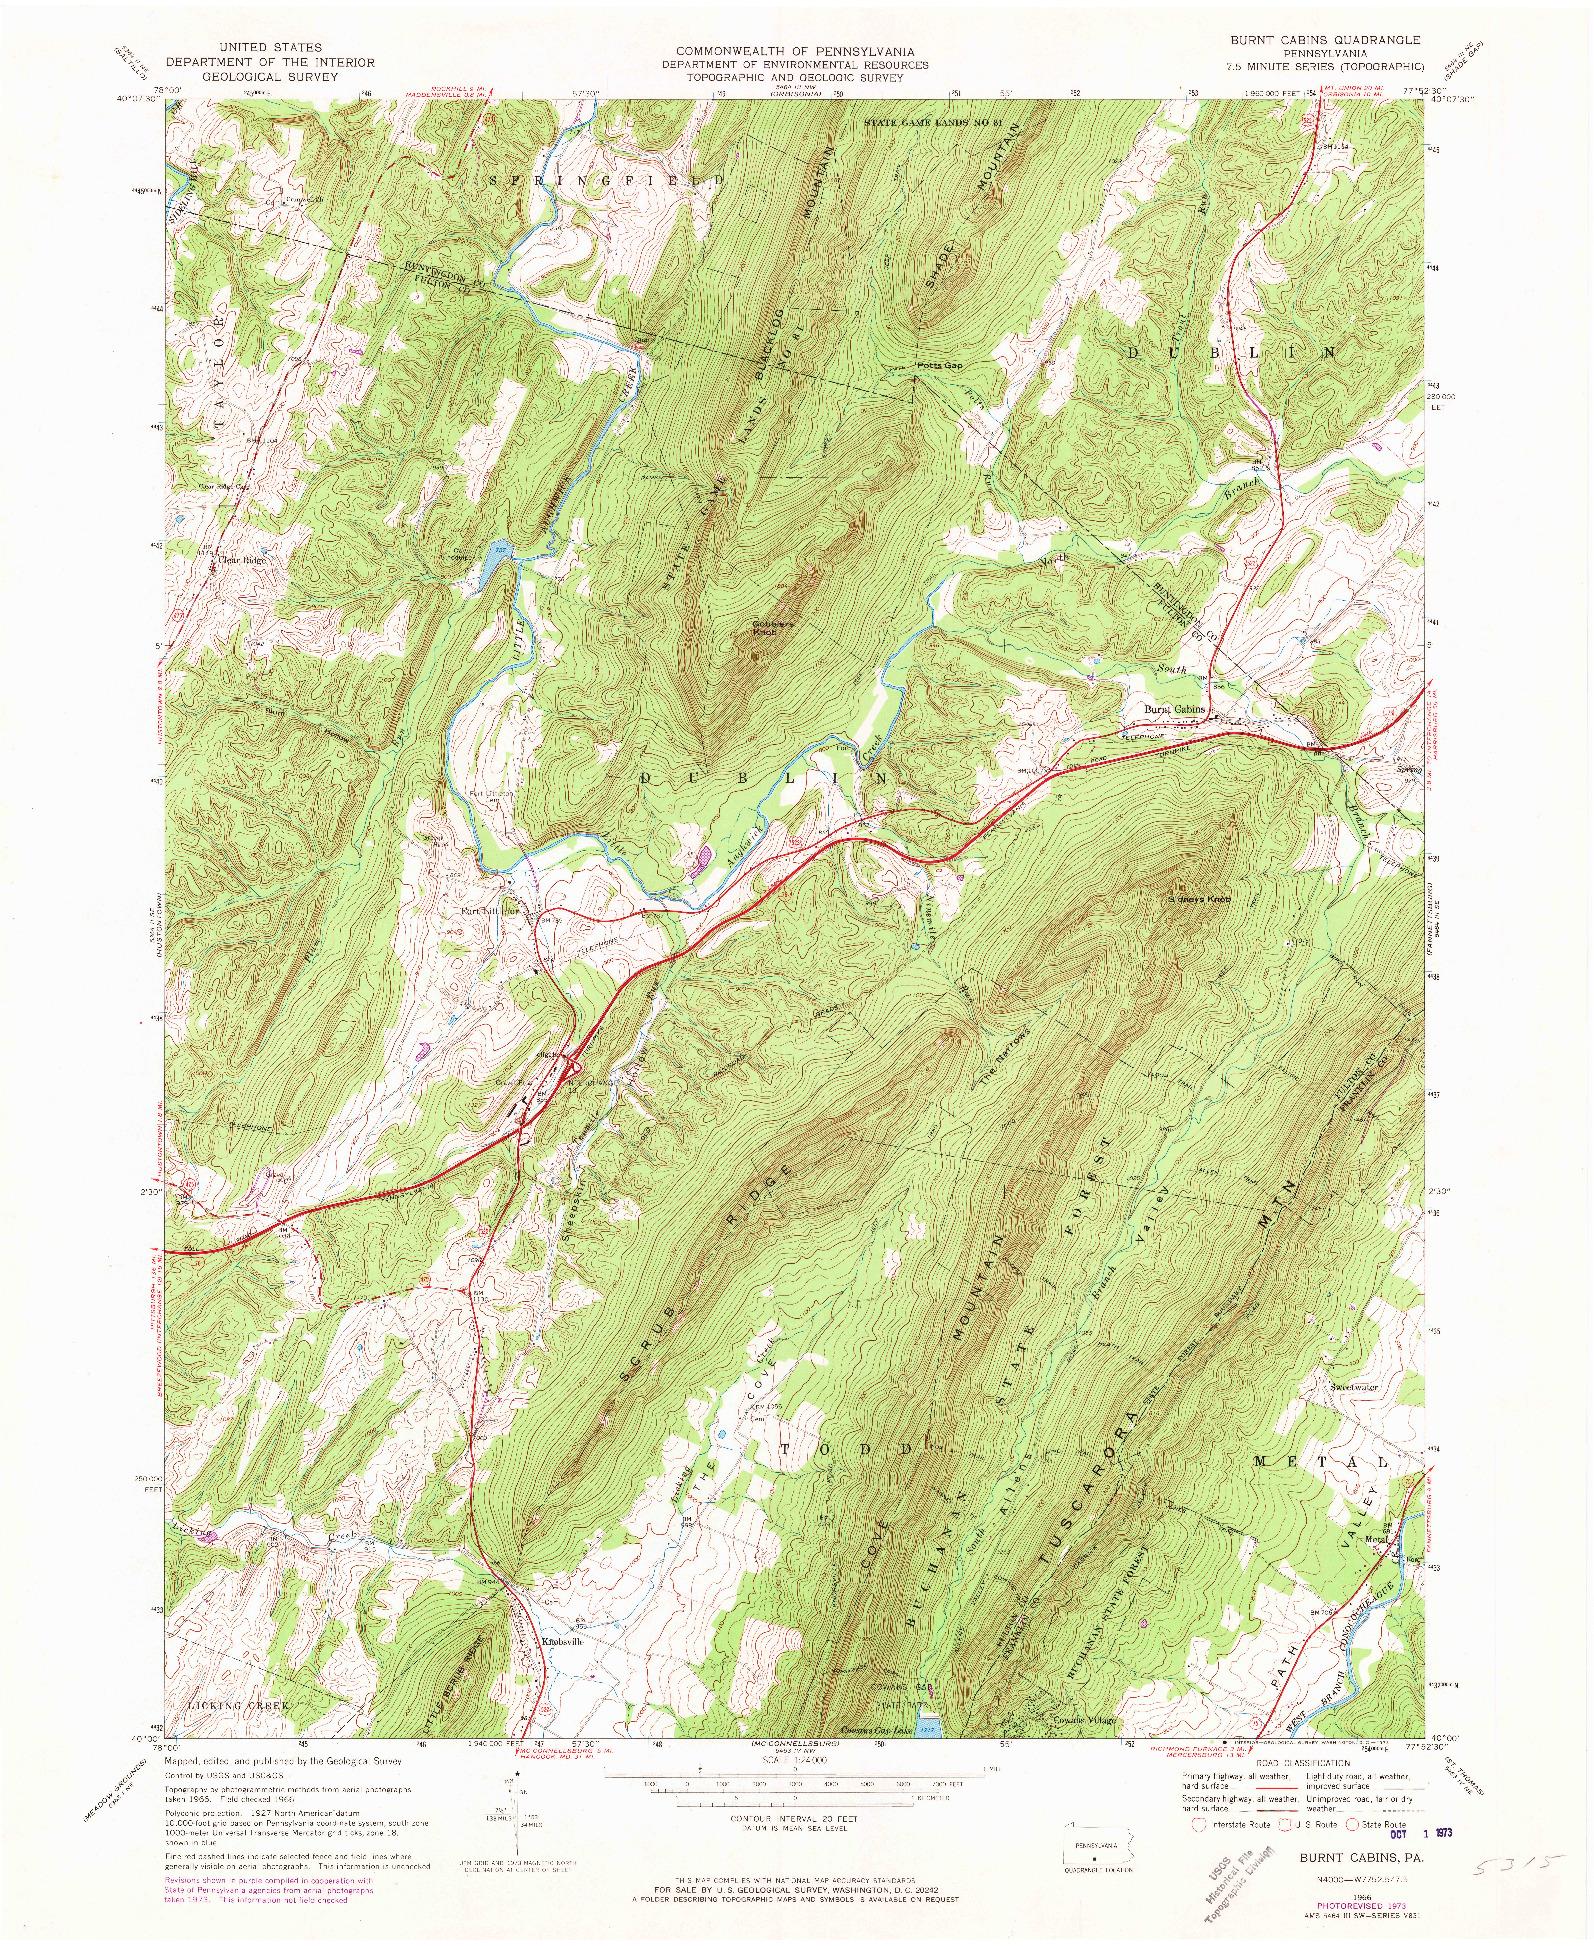 USGS 1:24000-SCALE QUADRANGLE FOR BURNT CABINS, PA 1966